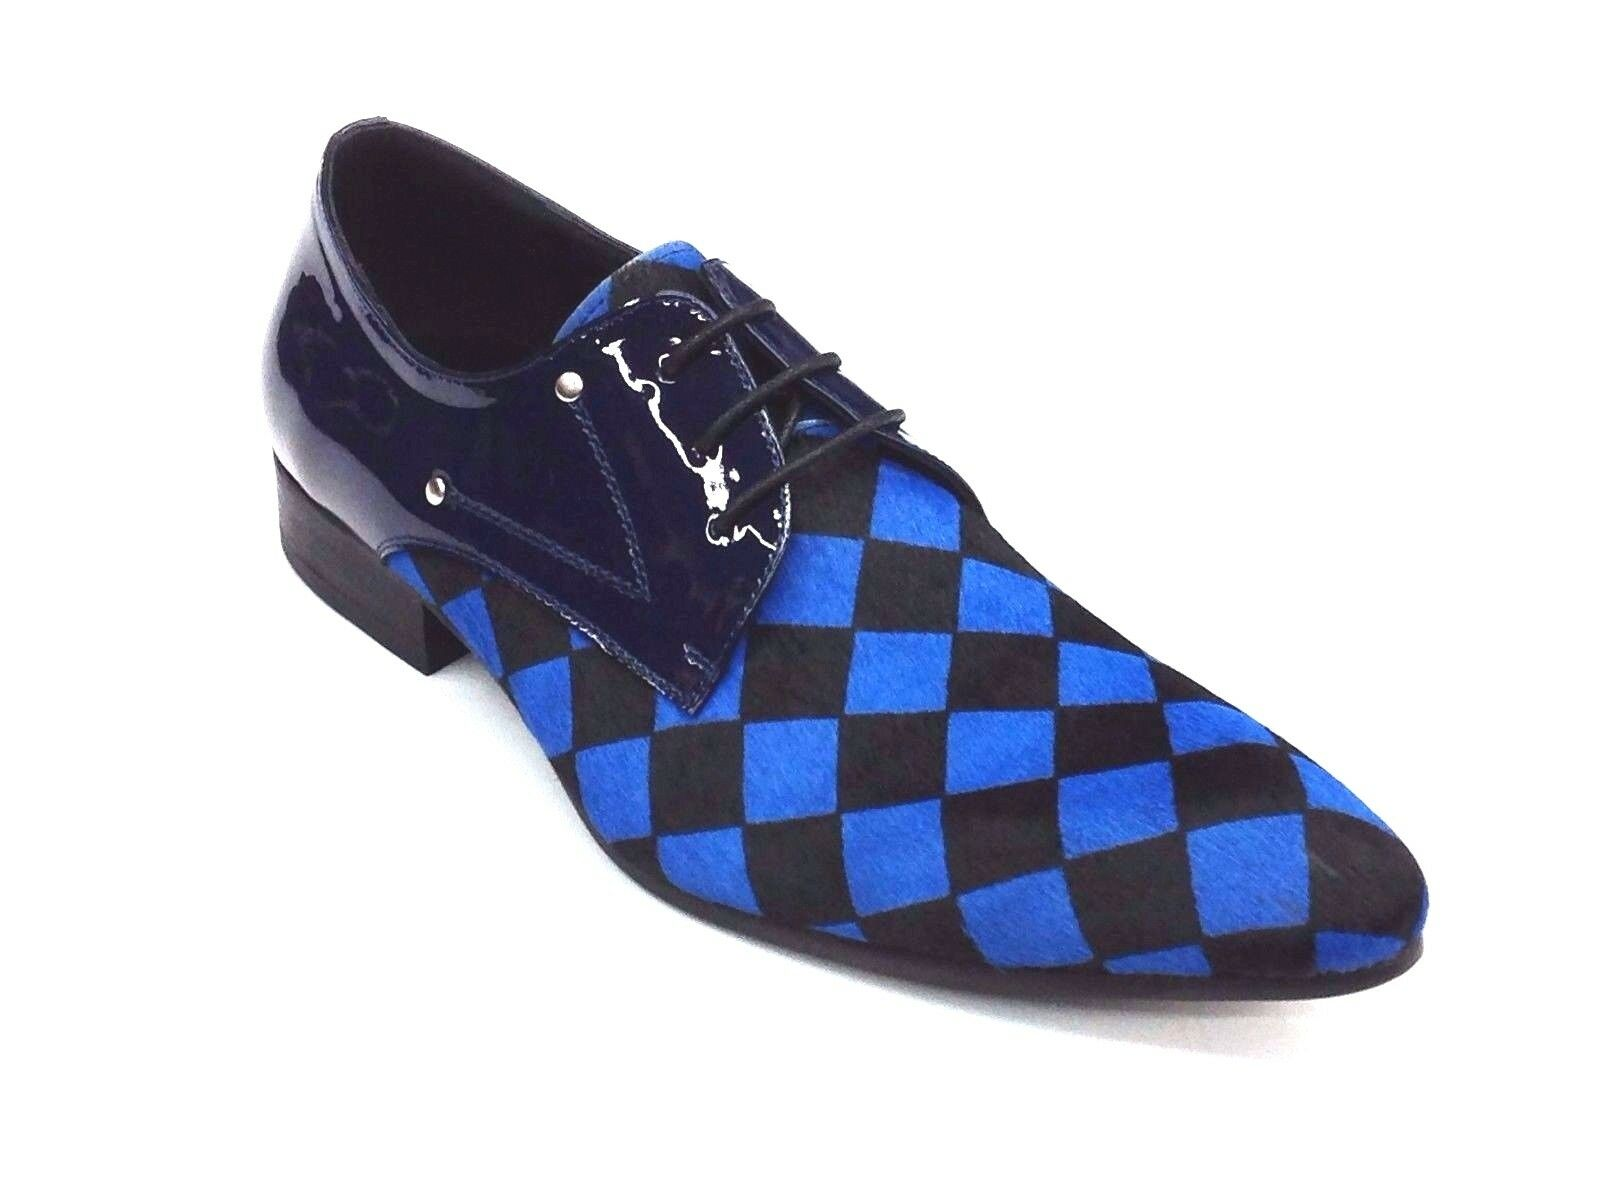 Men Fashion schuhe ZOTA Lace Up Pony Hair, Leather Checker Pointe Toe HX750 Blau